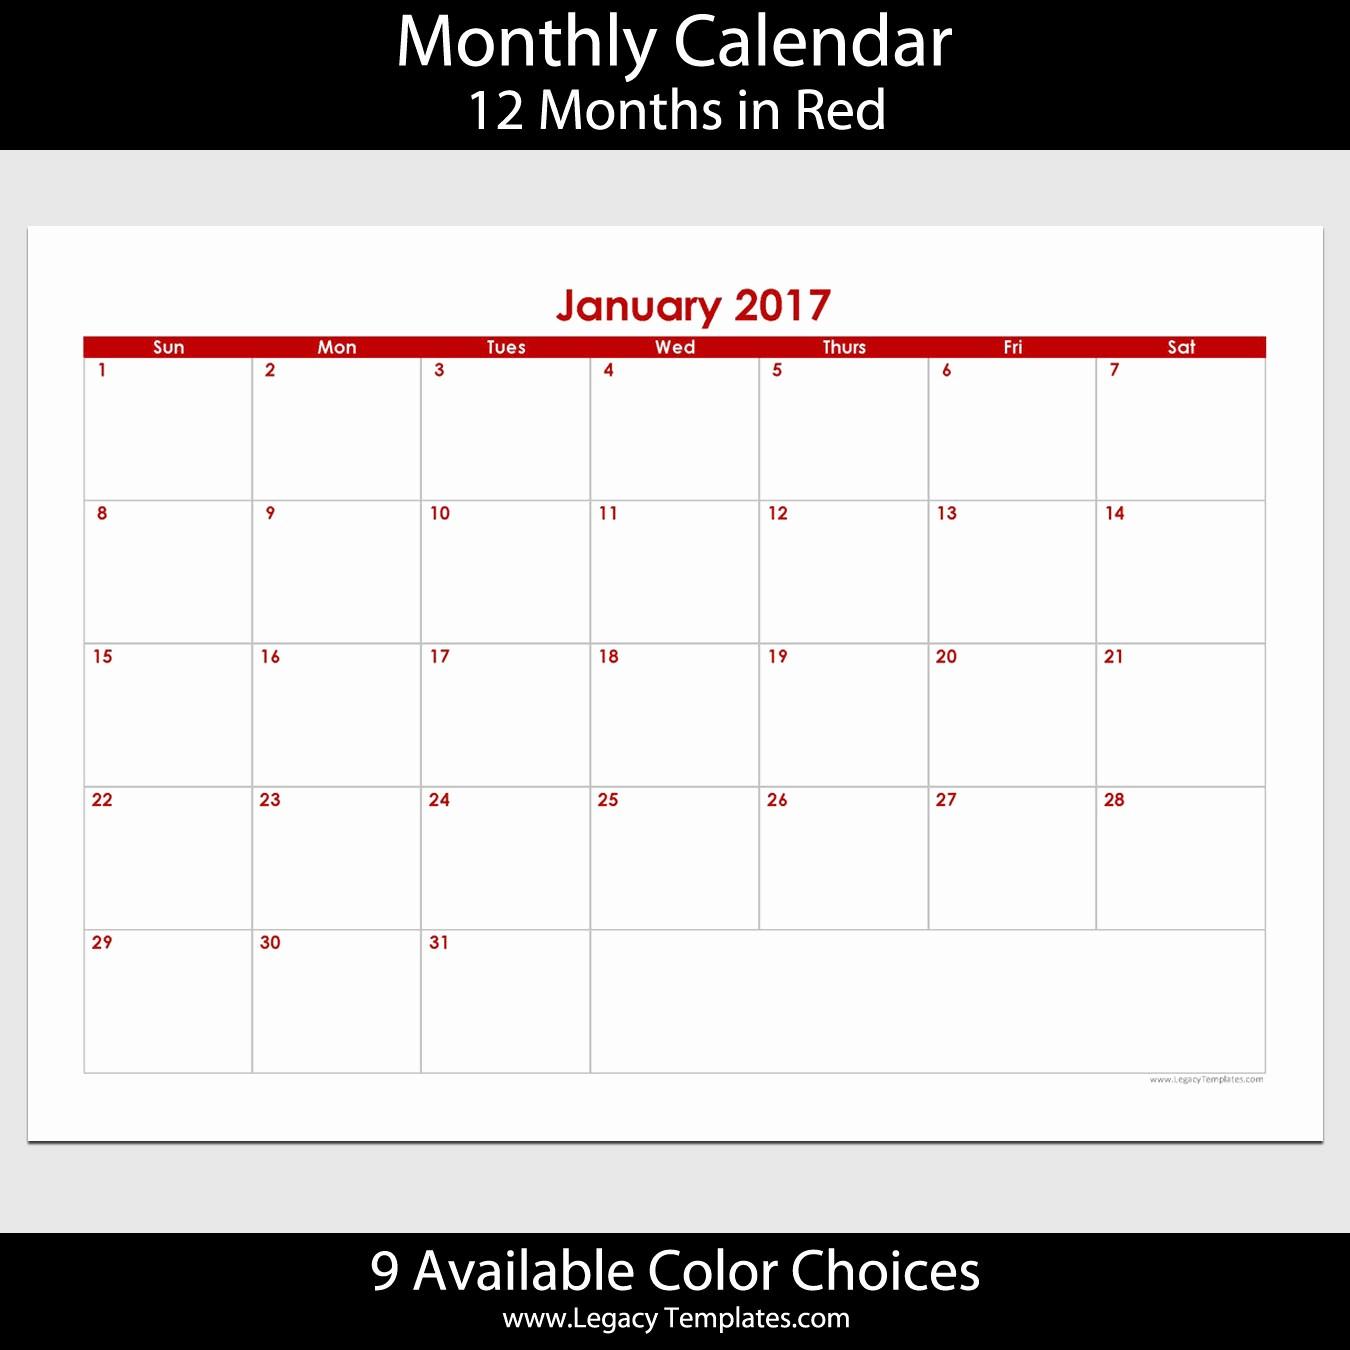 2017 Calendar Month by Month New 2017 12 Month Landscape Calendar – A5